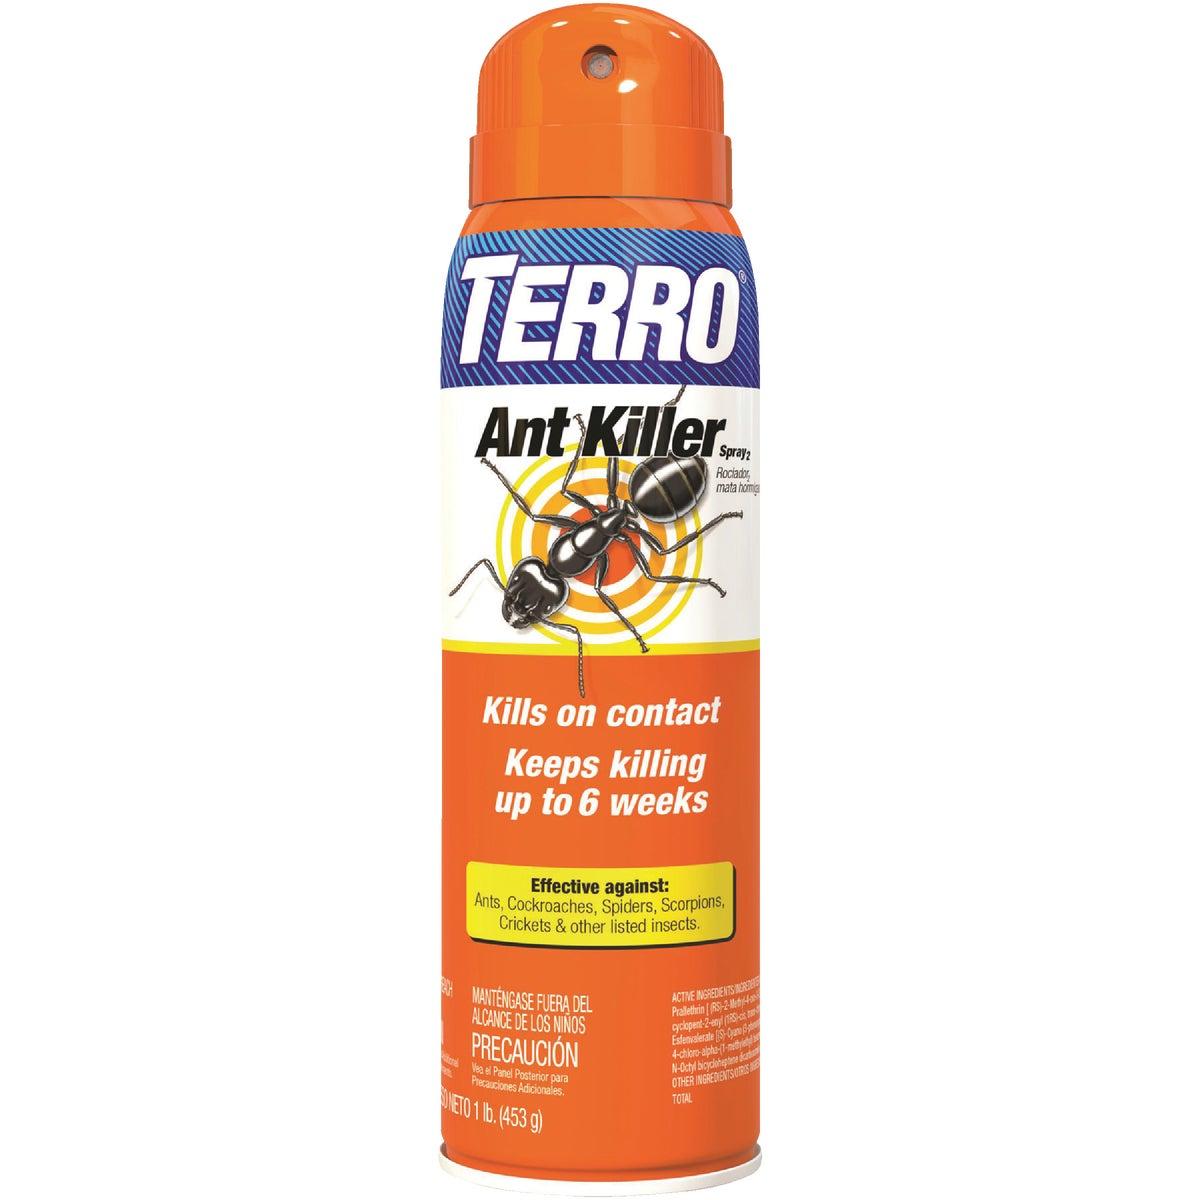 Terro 16 oz Ant Killer Aerosol  T401 (Discontinued by Manufacturer)